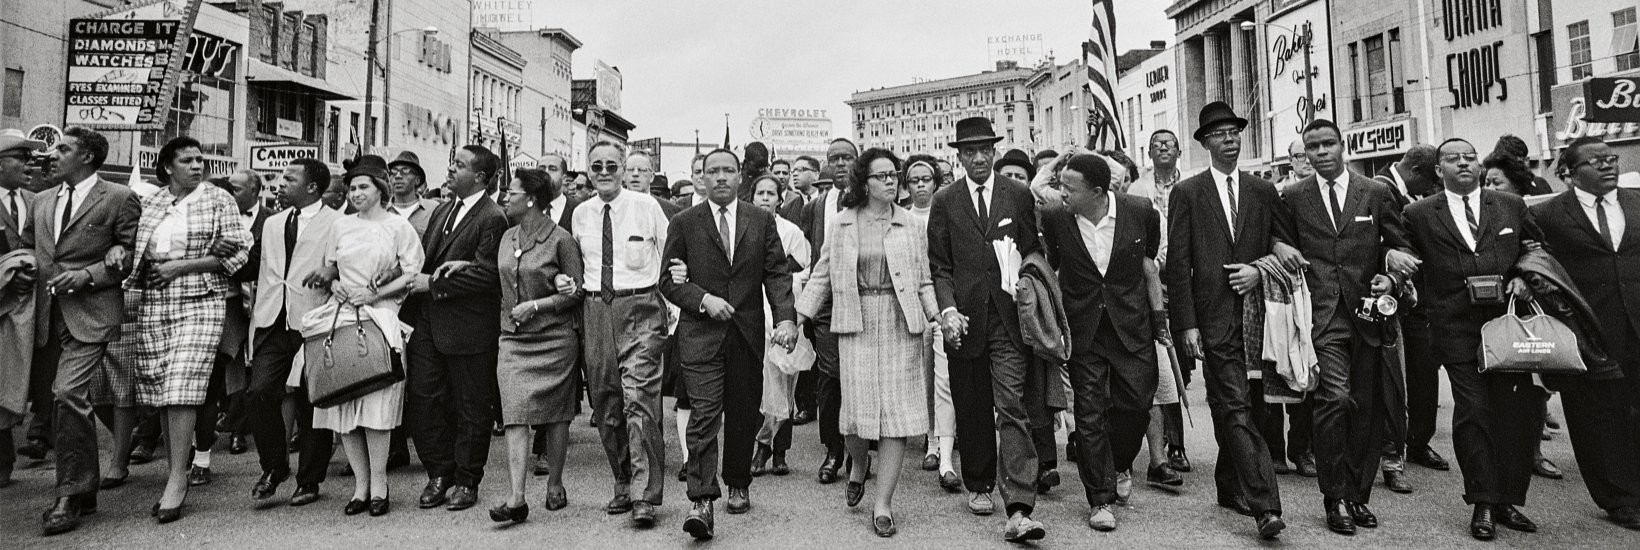 Steve Schapiro Martin Luther King Jr